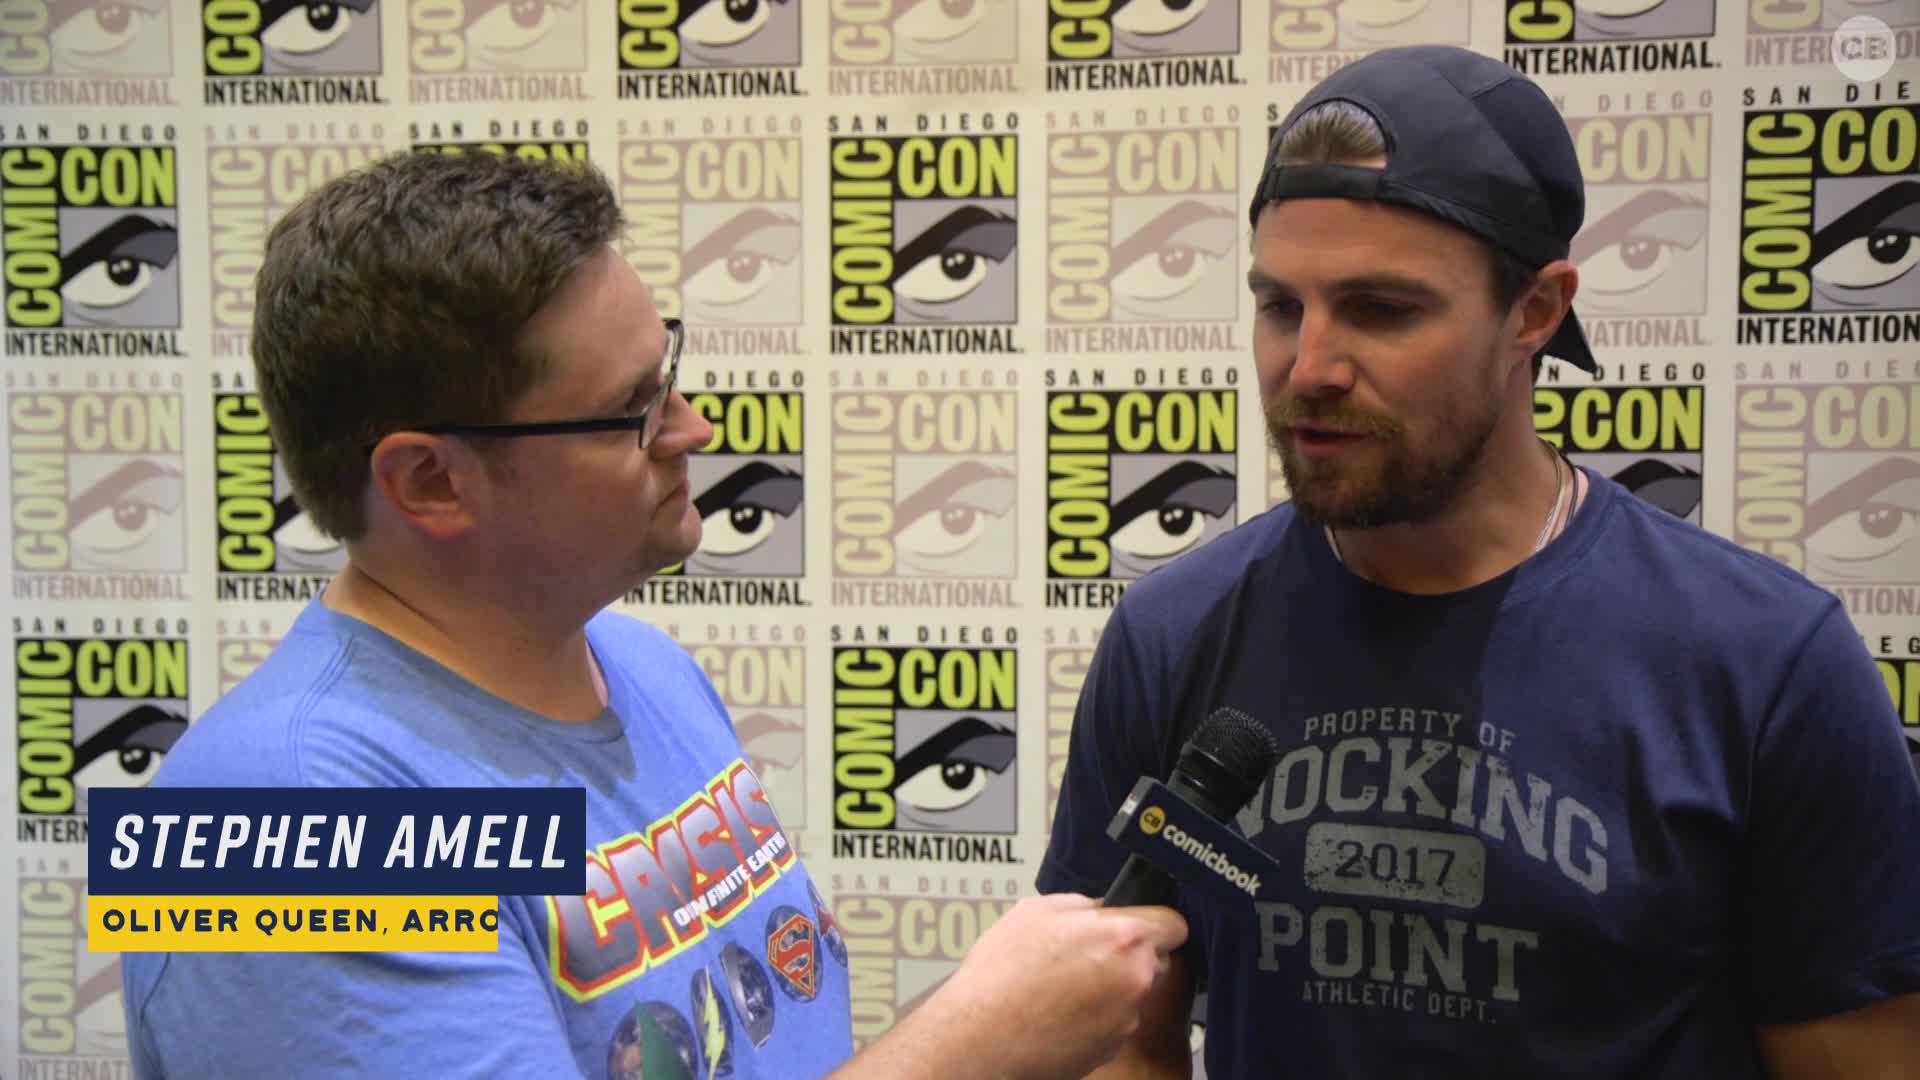 Stephen Amell Talks ARROW - San Diego Comic-Con 2019 Interview screen capture